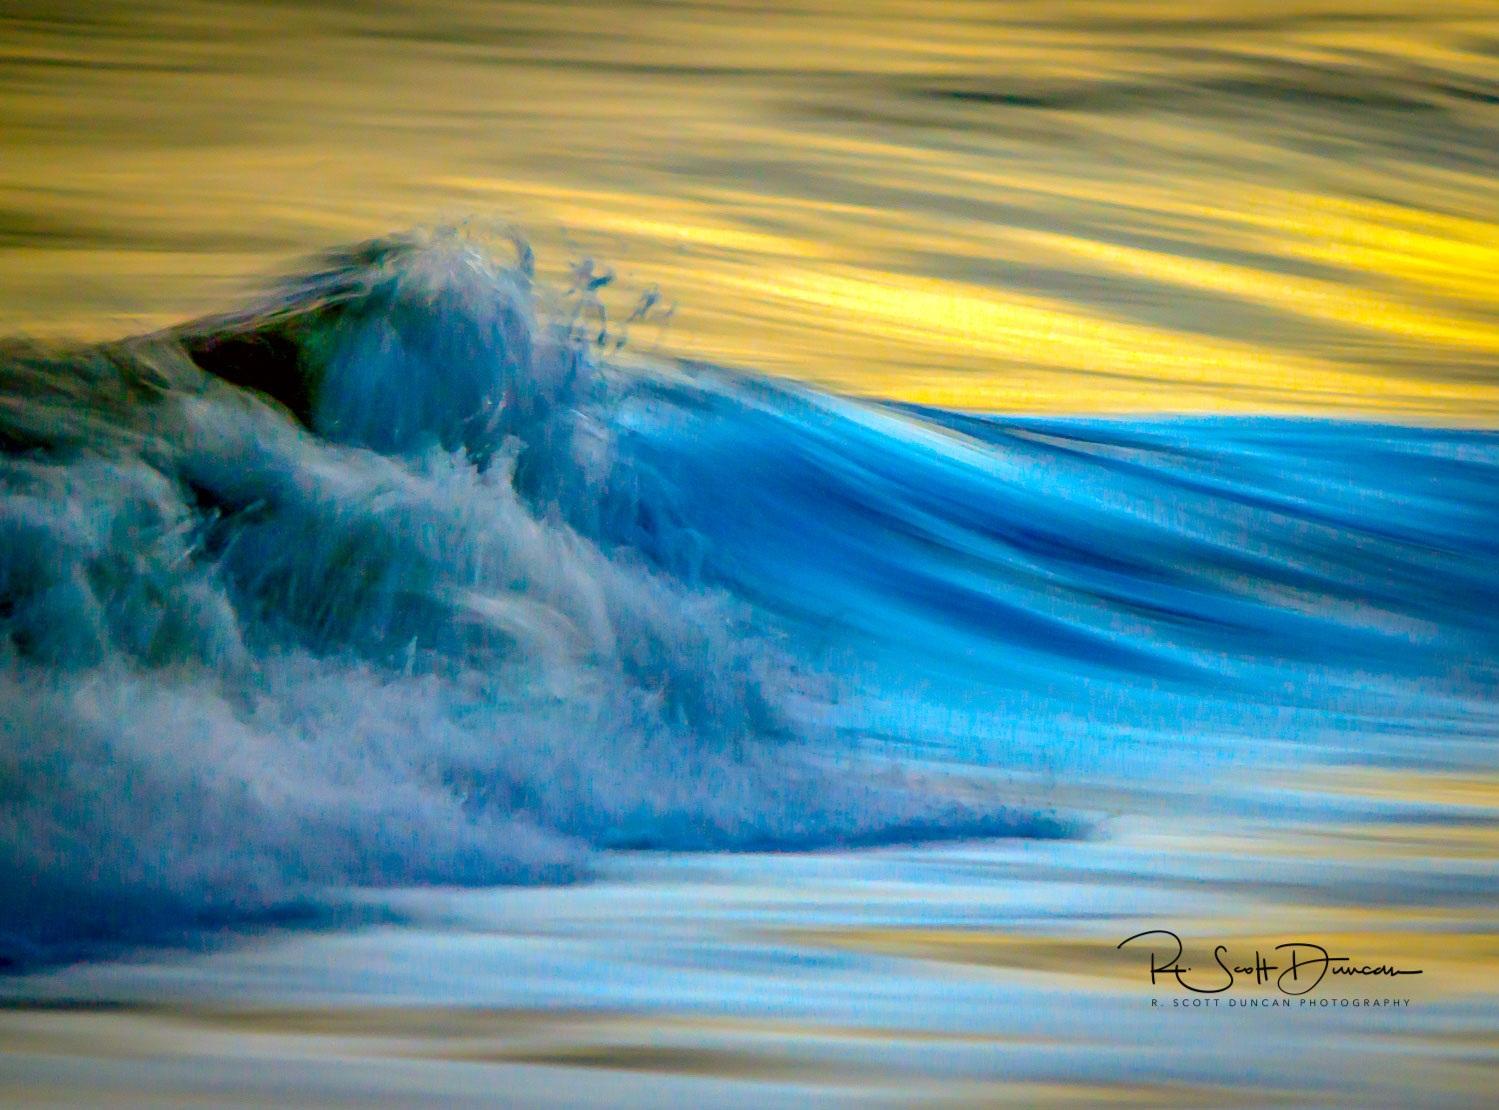 sunrise-ocean-wave-abstract-florida.jpg